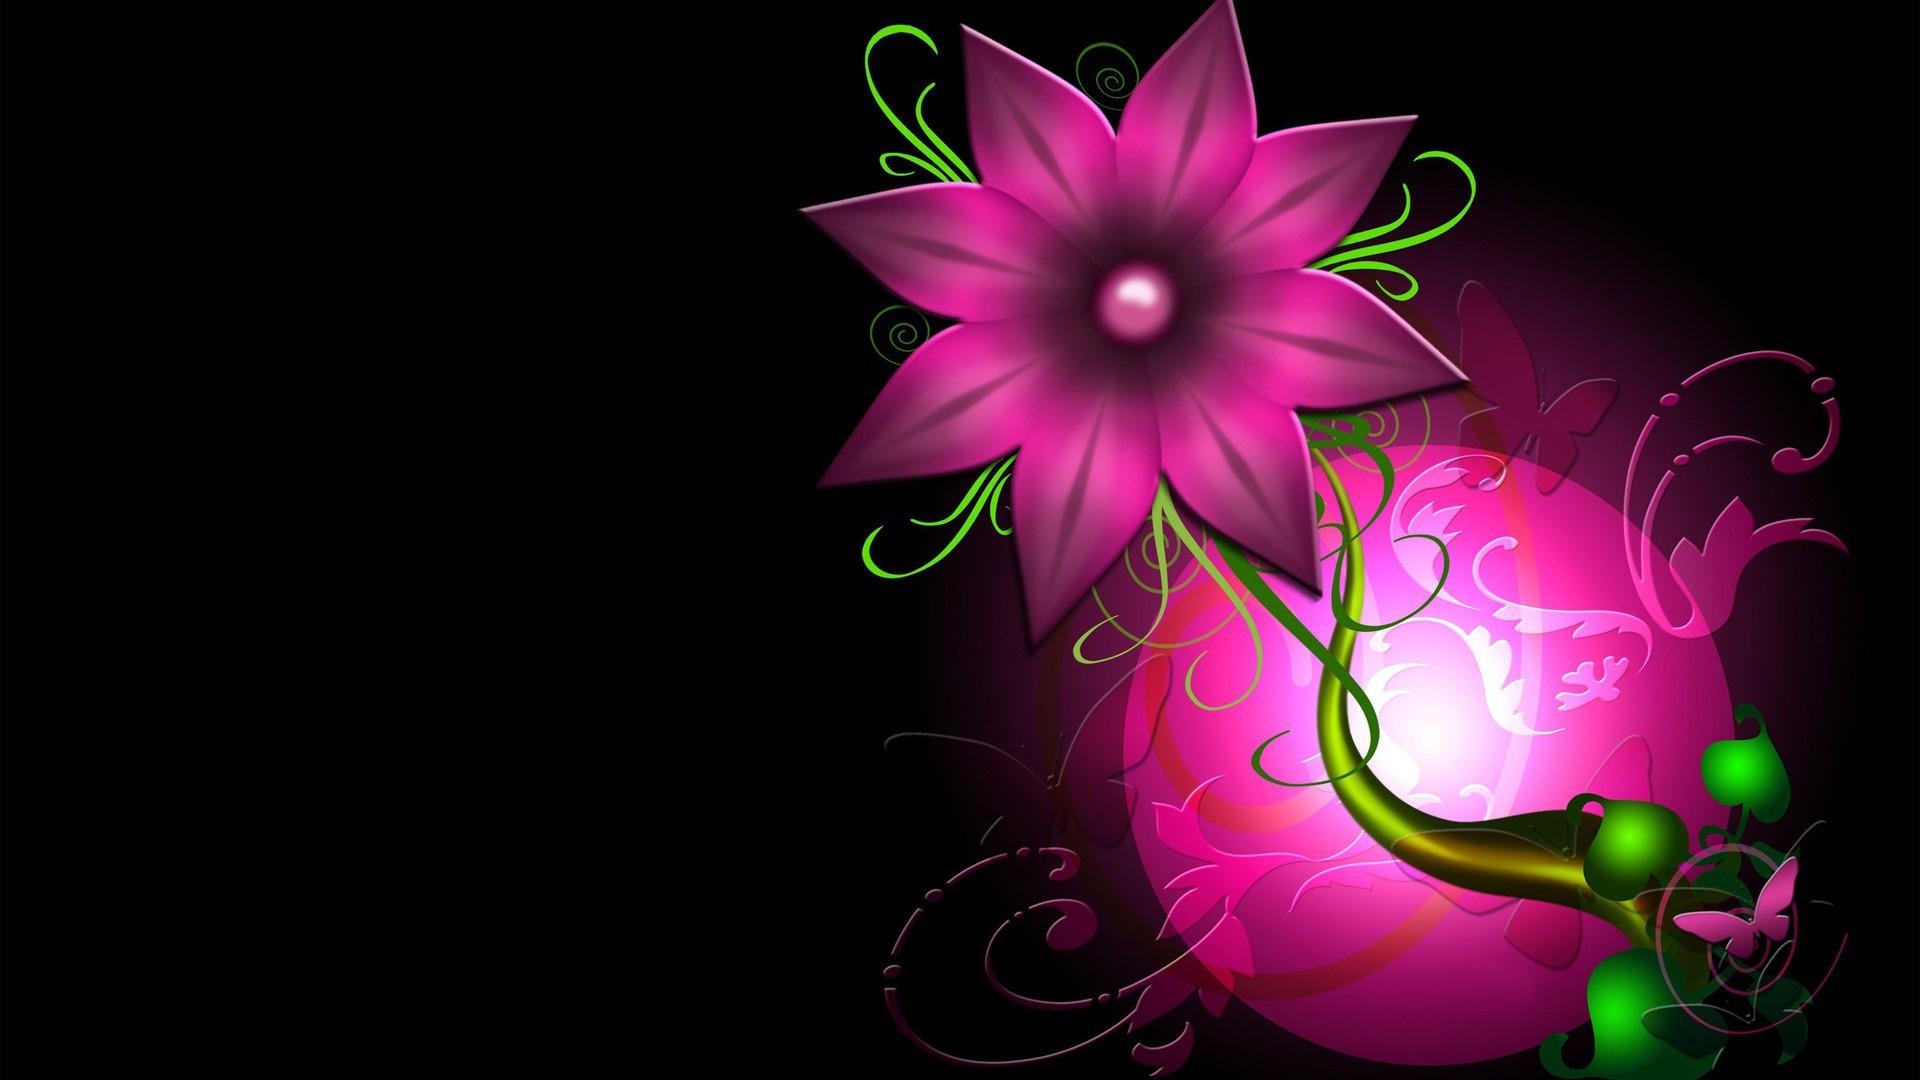 7. flower-emoji-wallpaper7-600×338